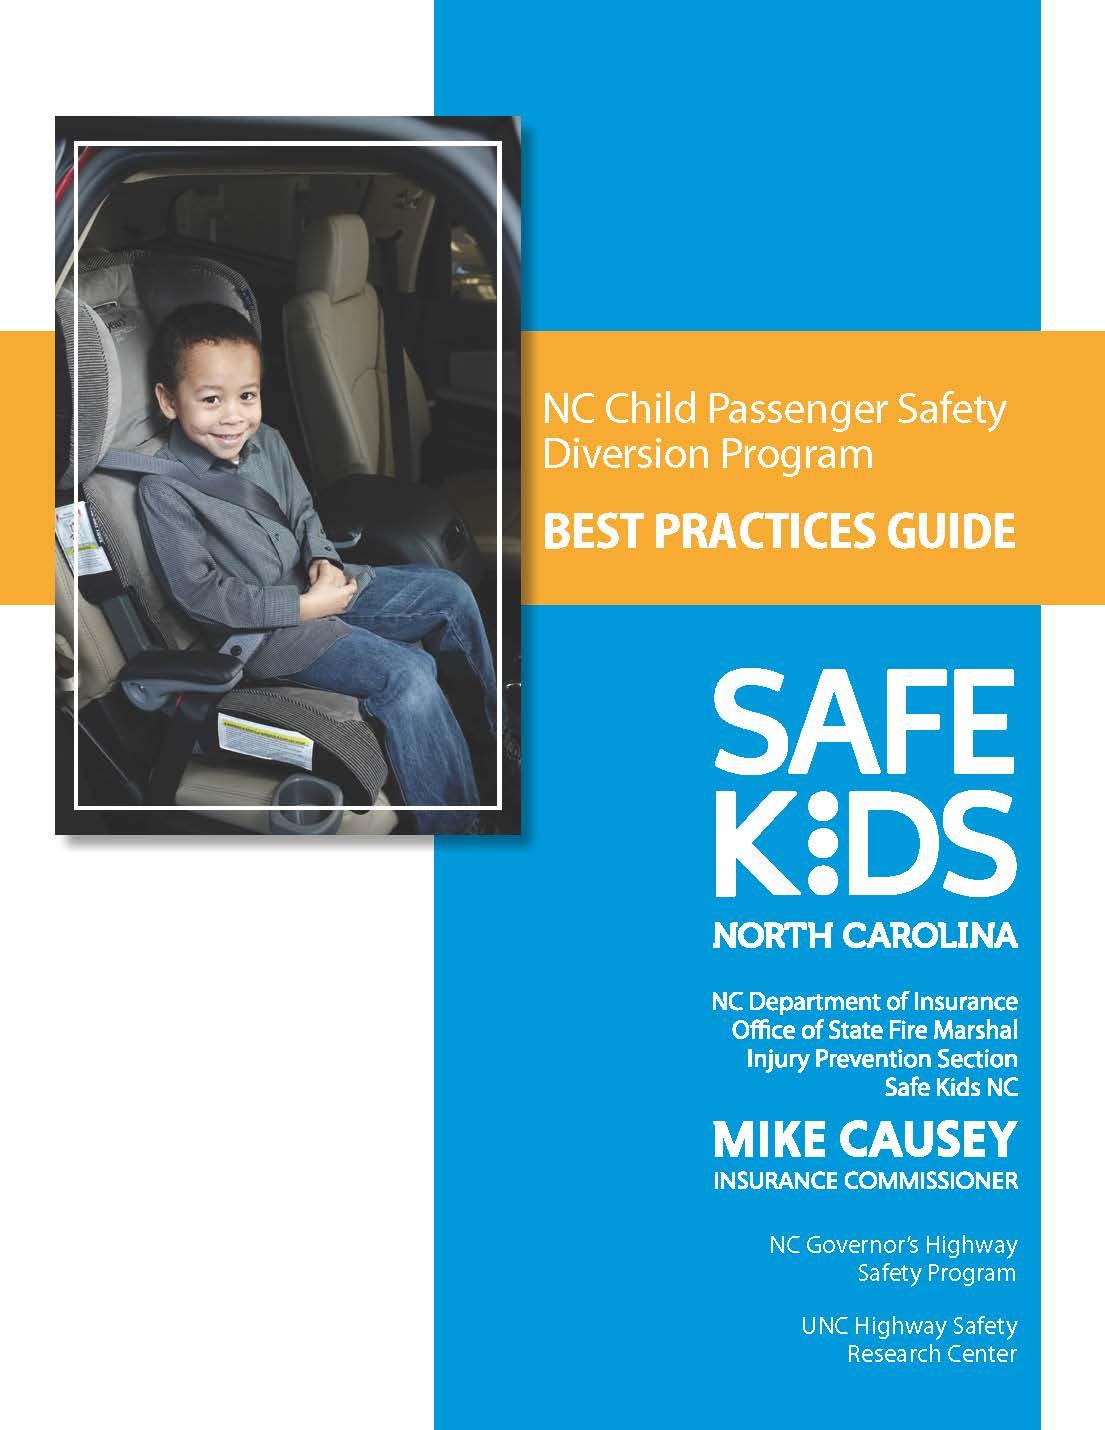 Image CPS Diversion Program Best Practice Guide-1st page